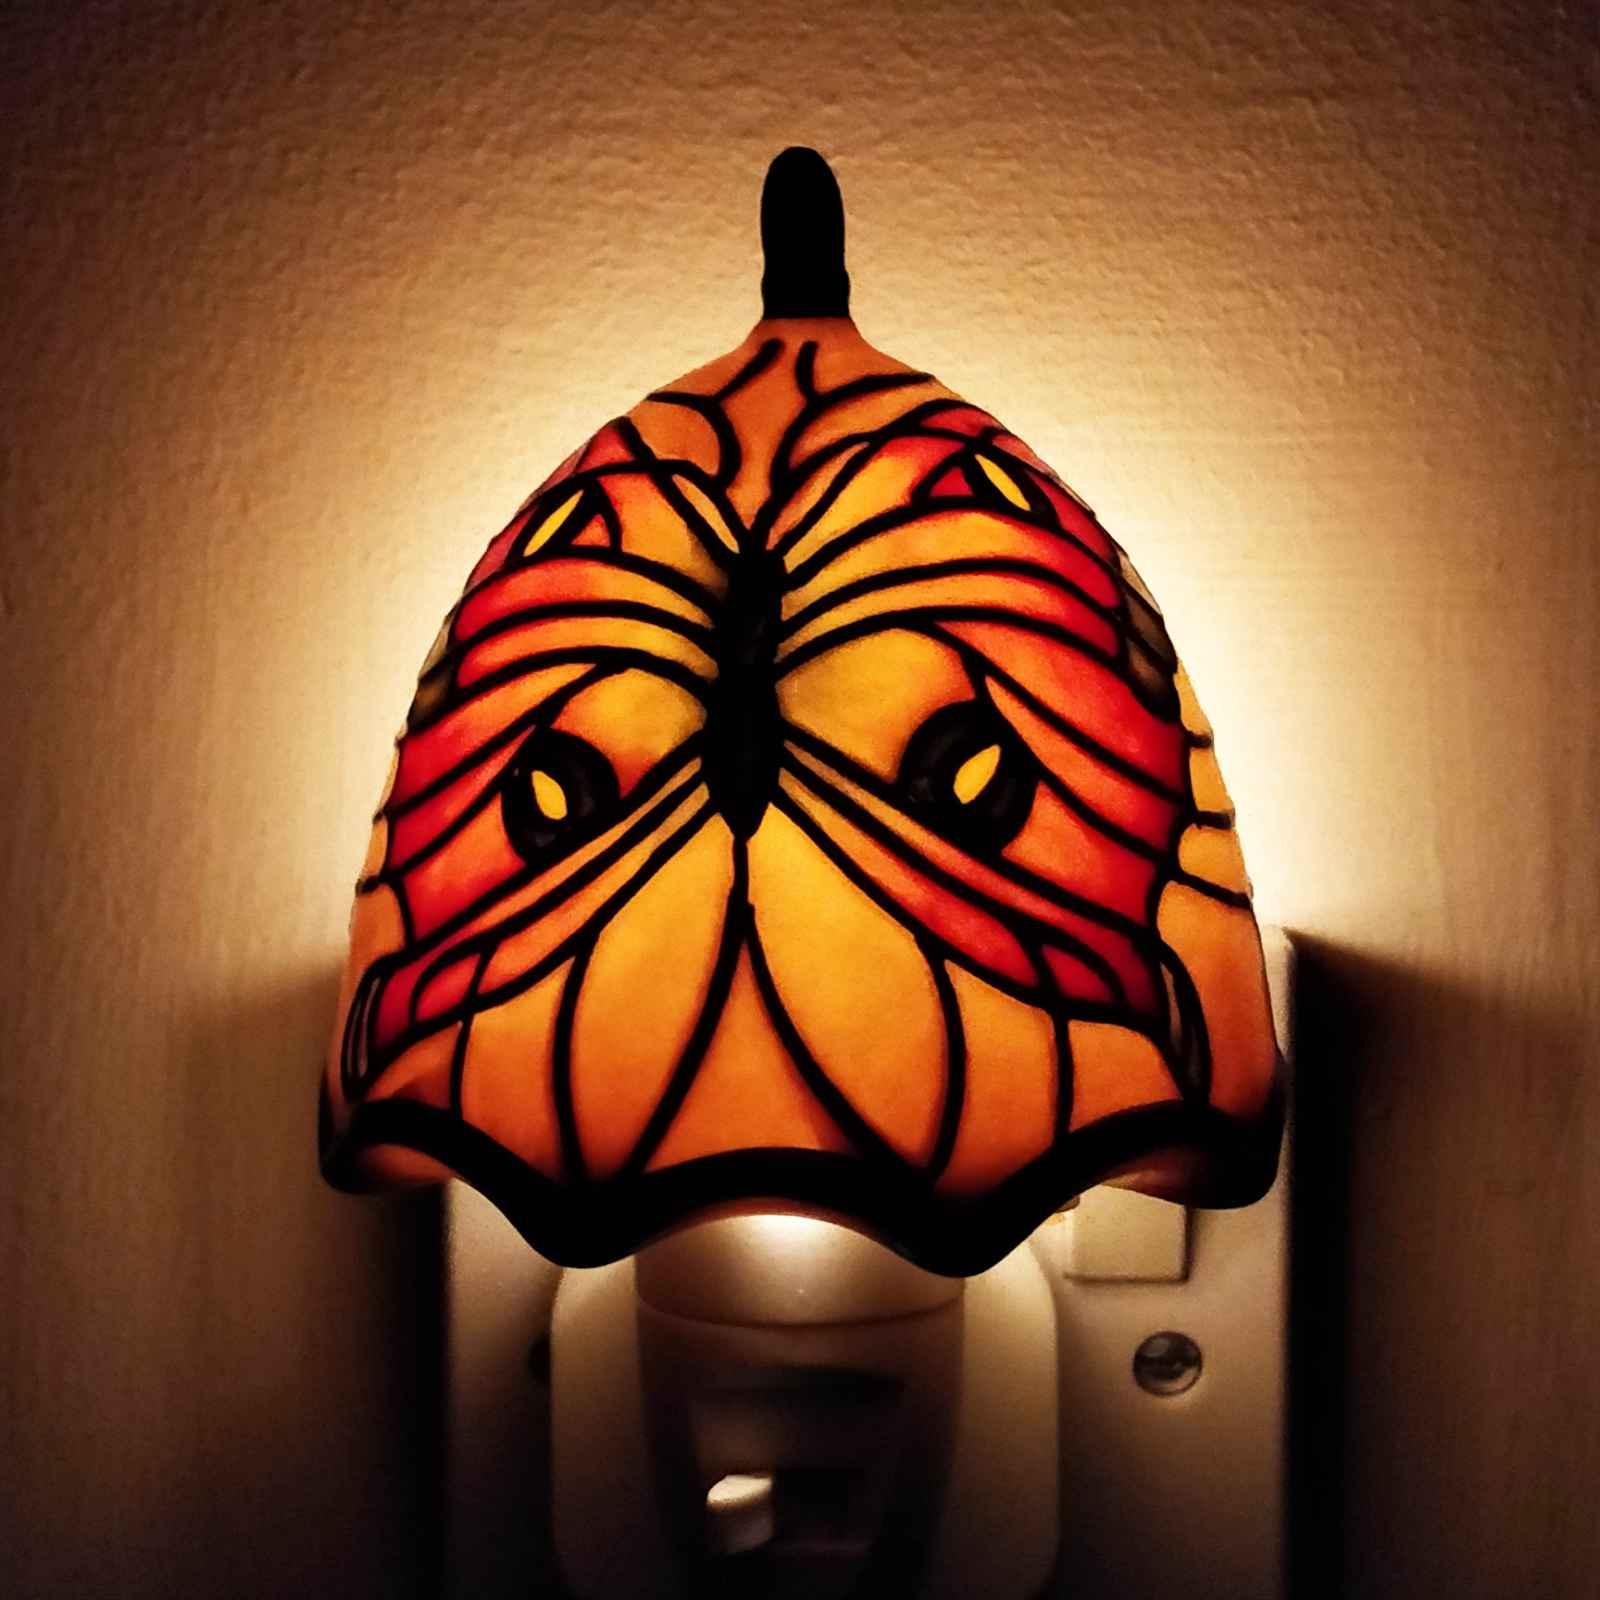 Butterfly Night Light OTW